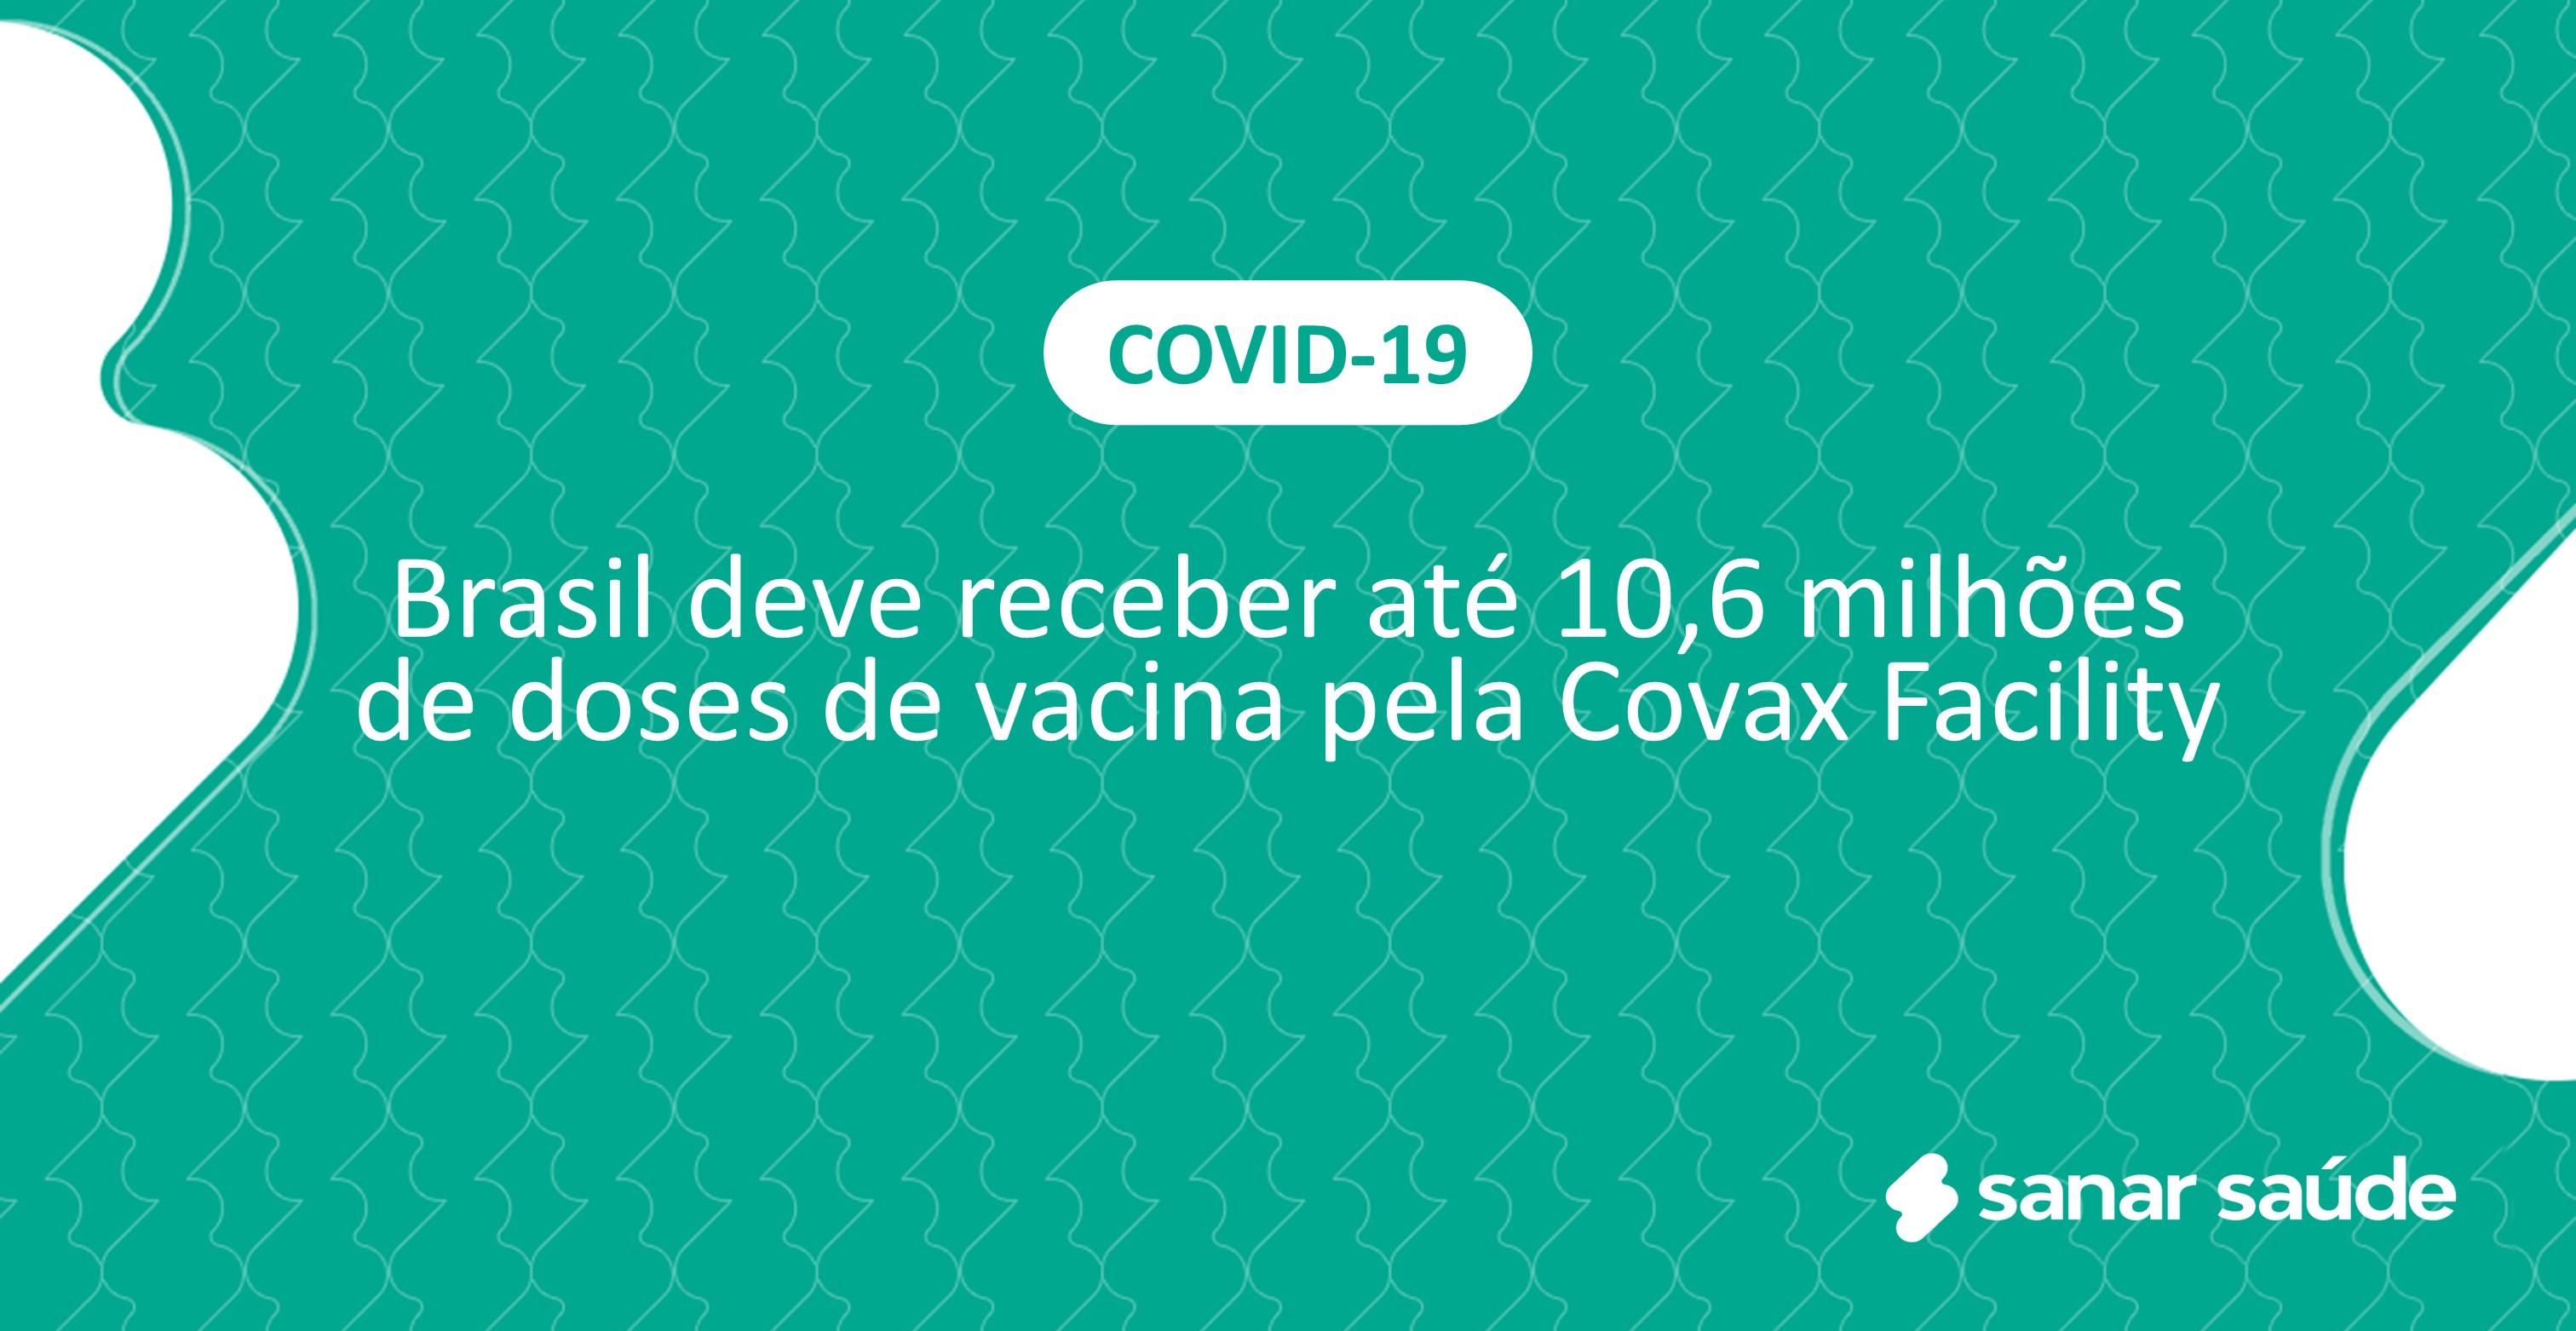 a-vacinas-covax-facility.jpg (432 KB)